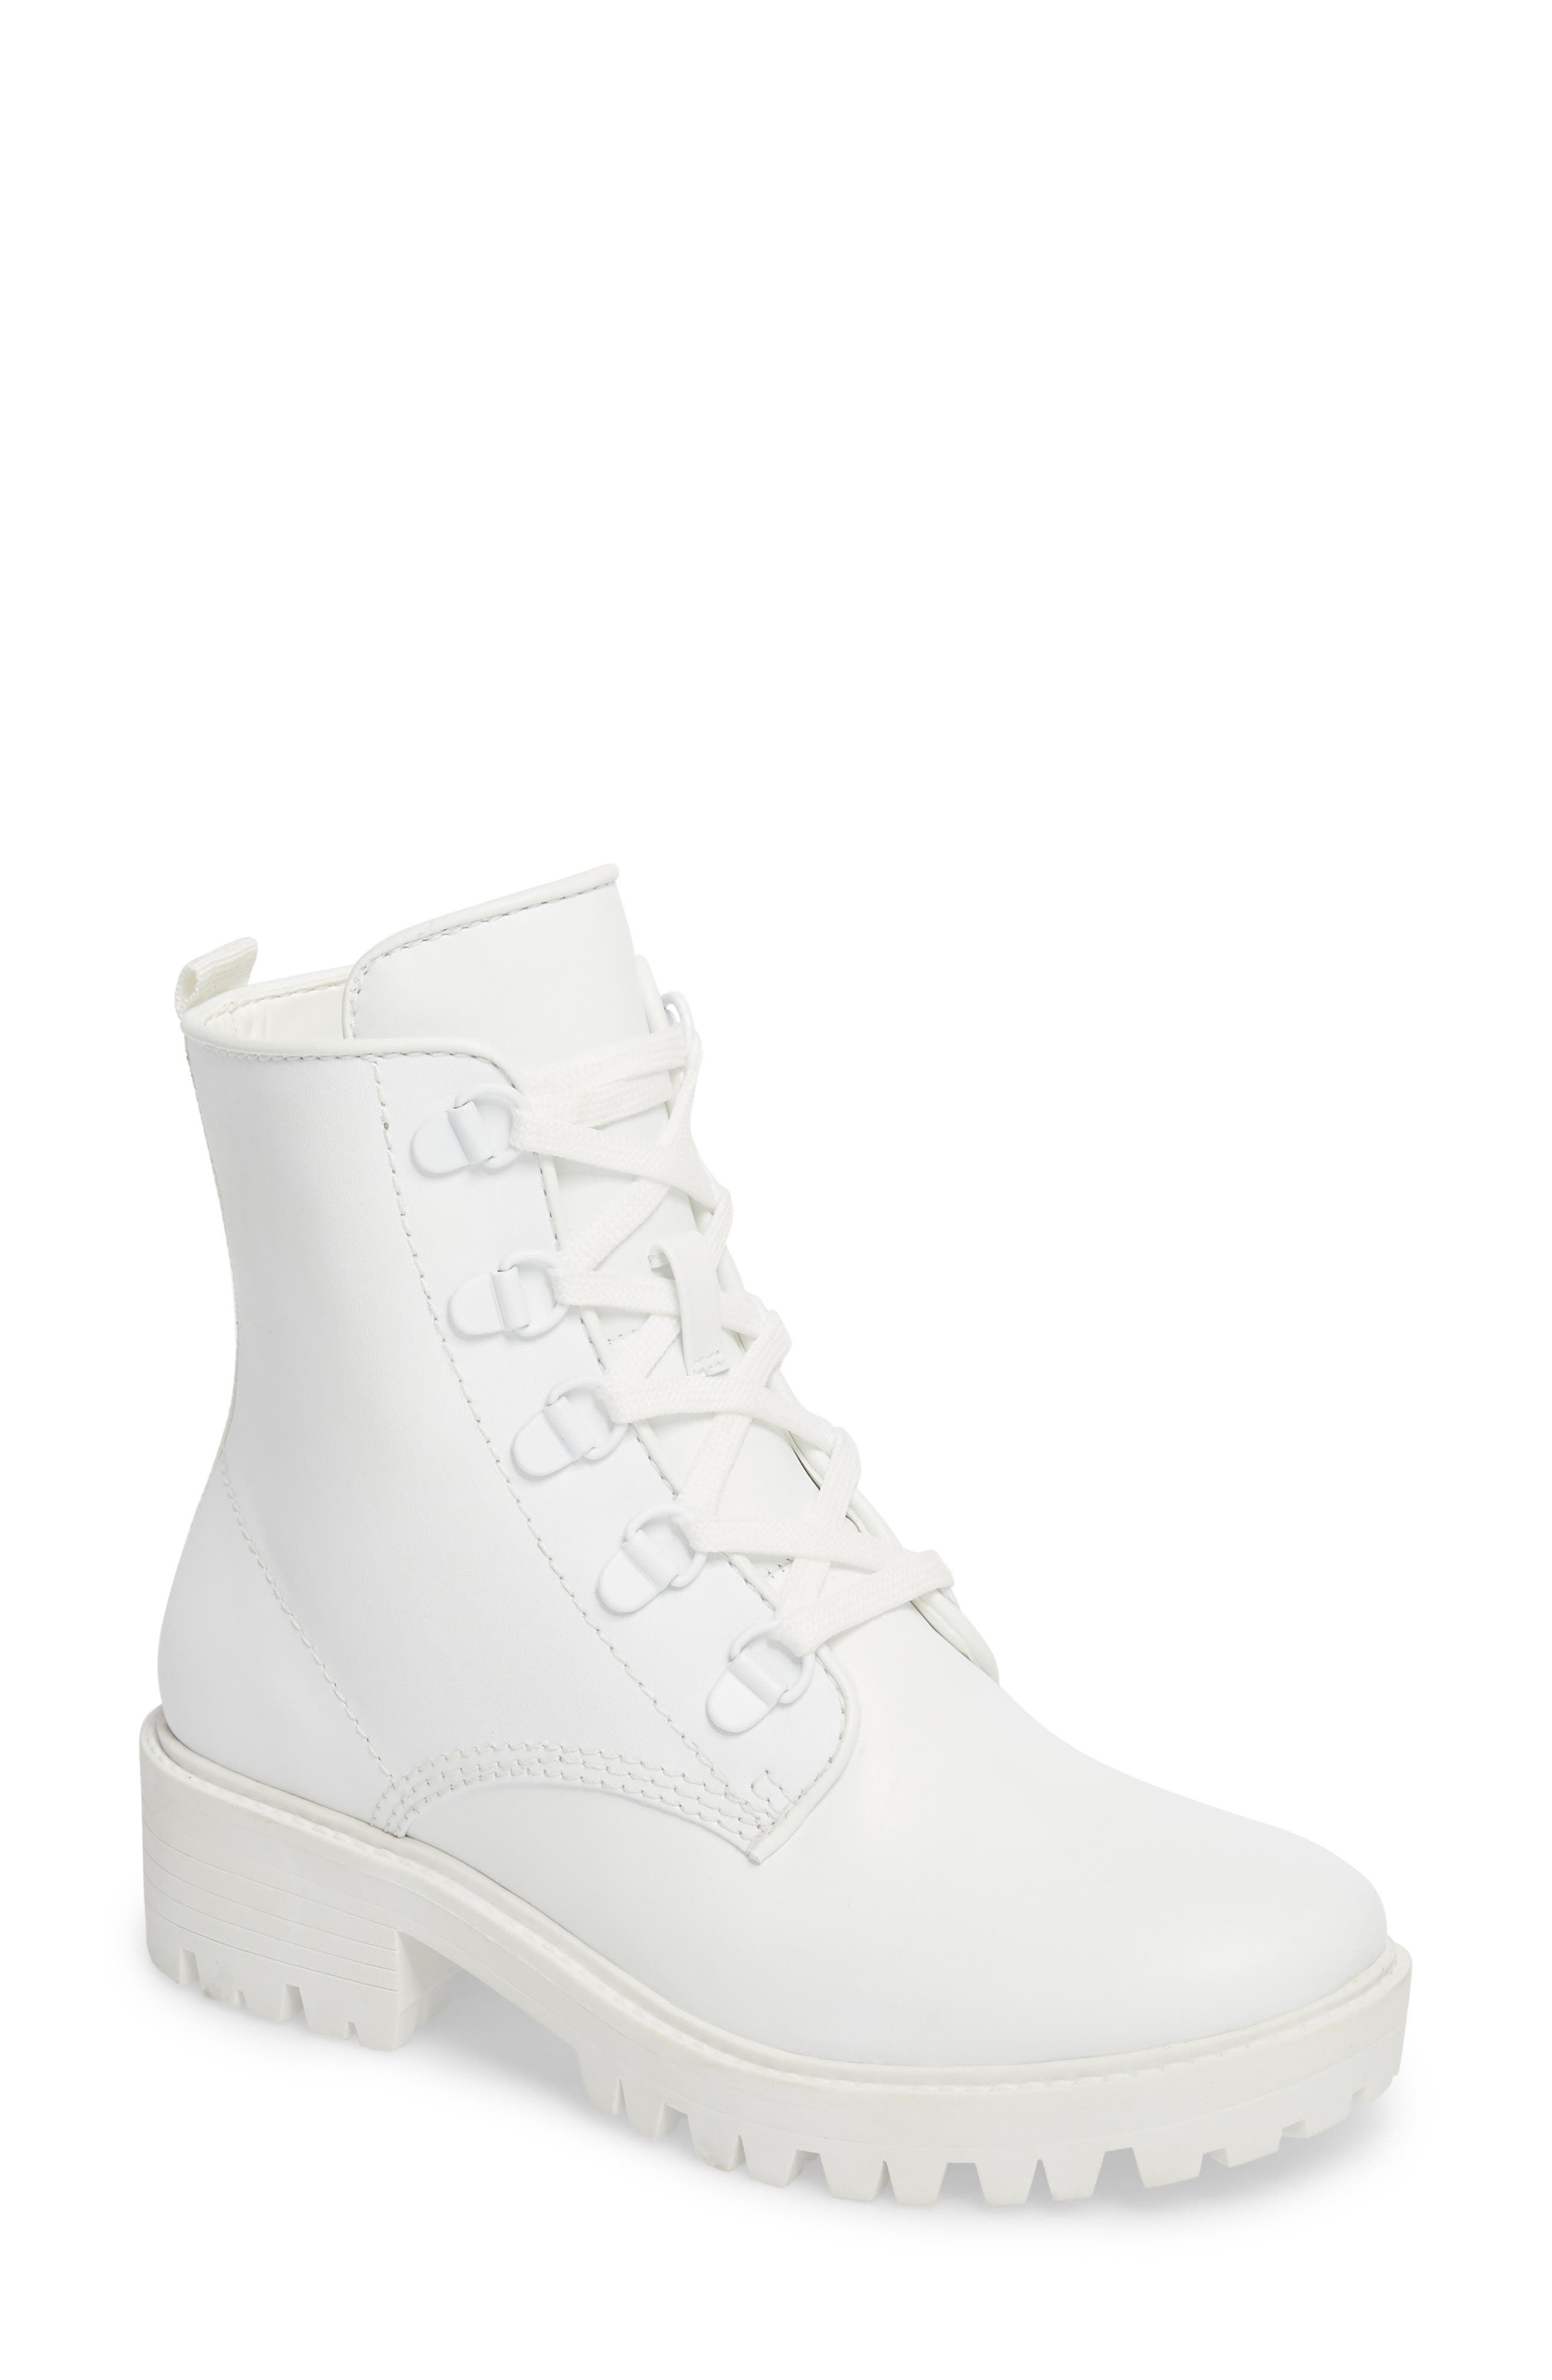 Military Boot,                         Main,                         color, White/ White/ White